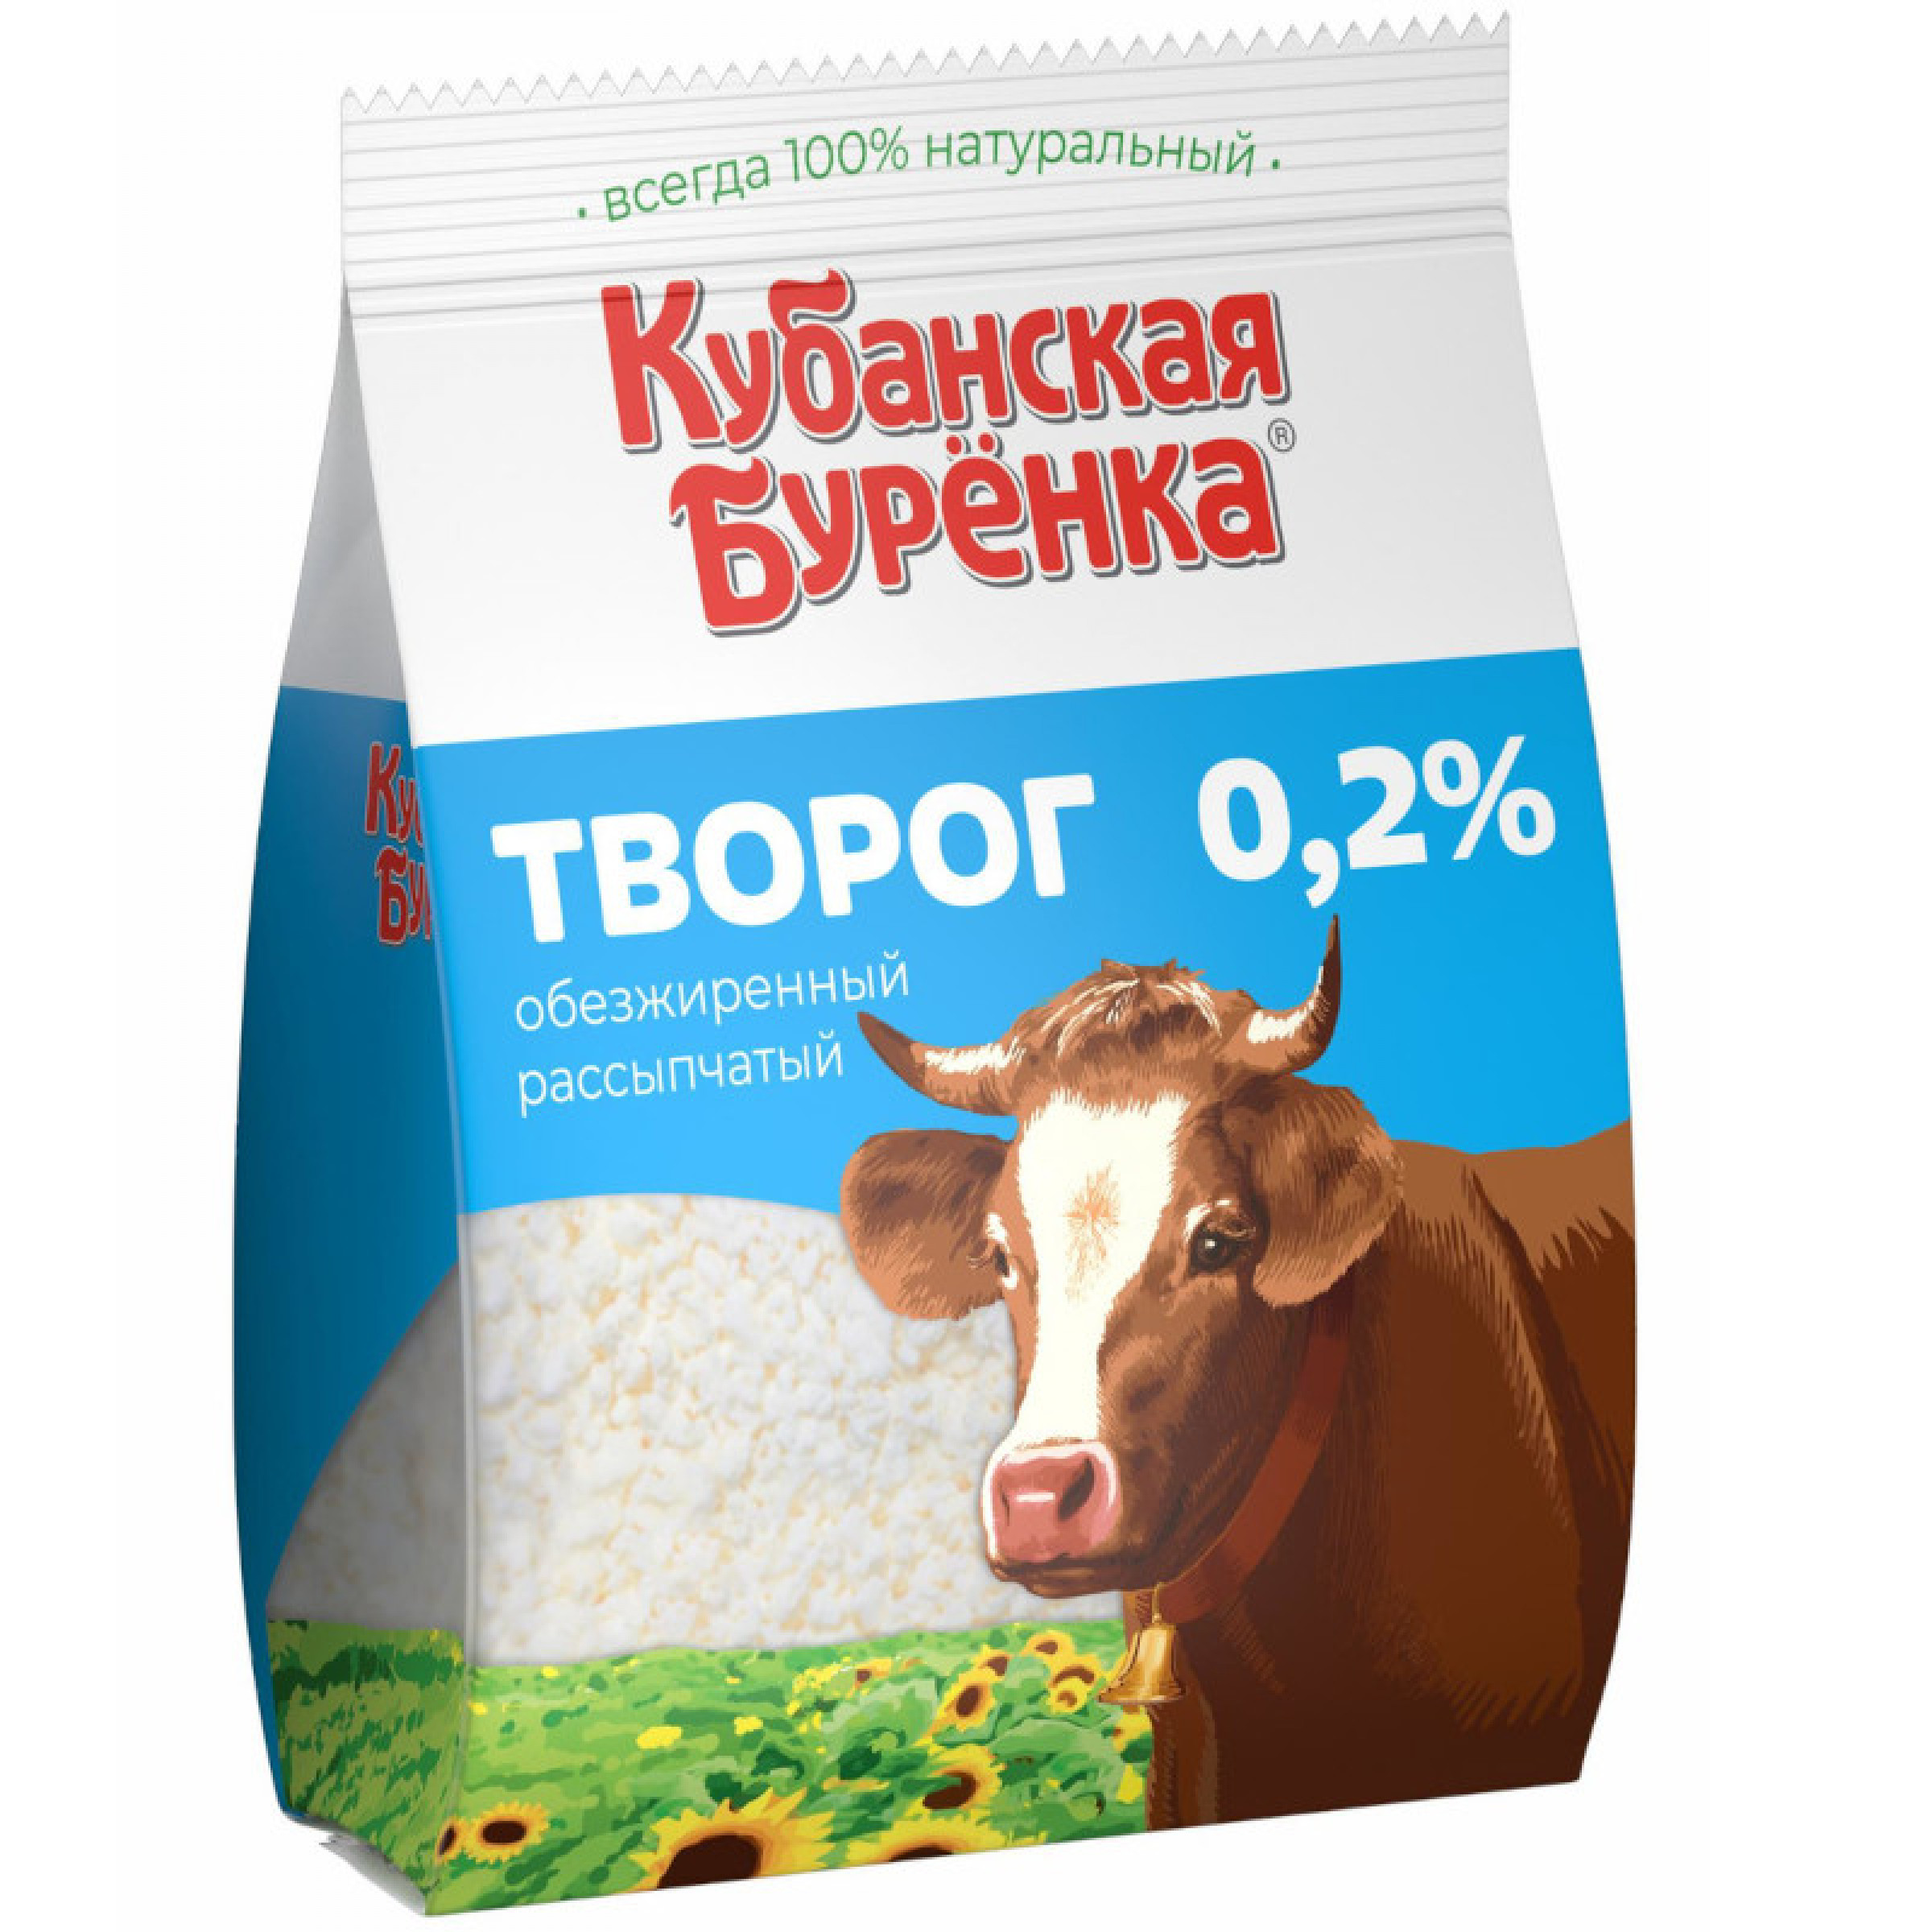 "Творог ""Кубанская Буренка"" 0. 2%, 300гр"